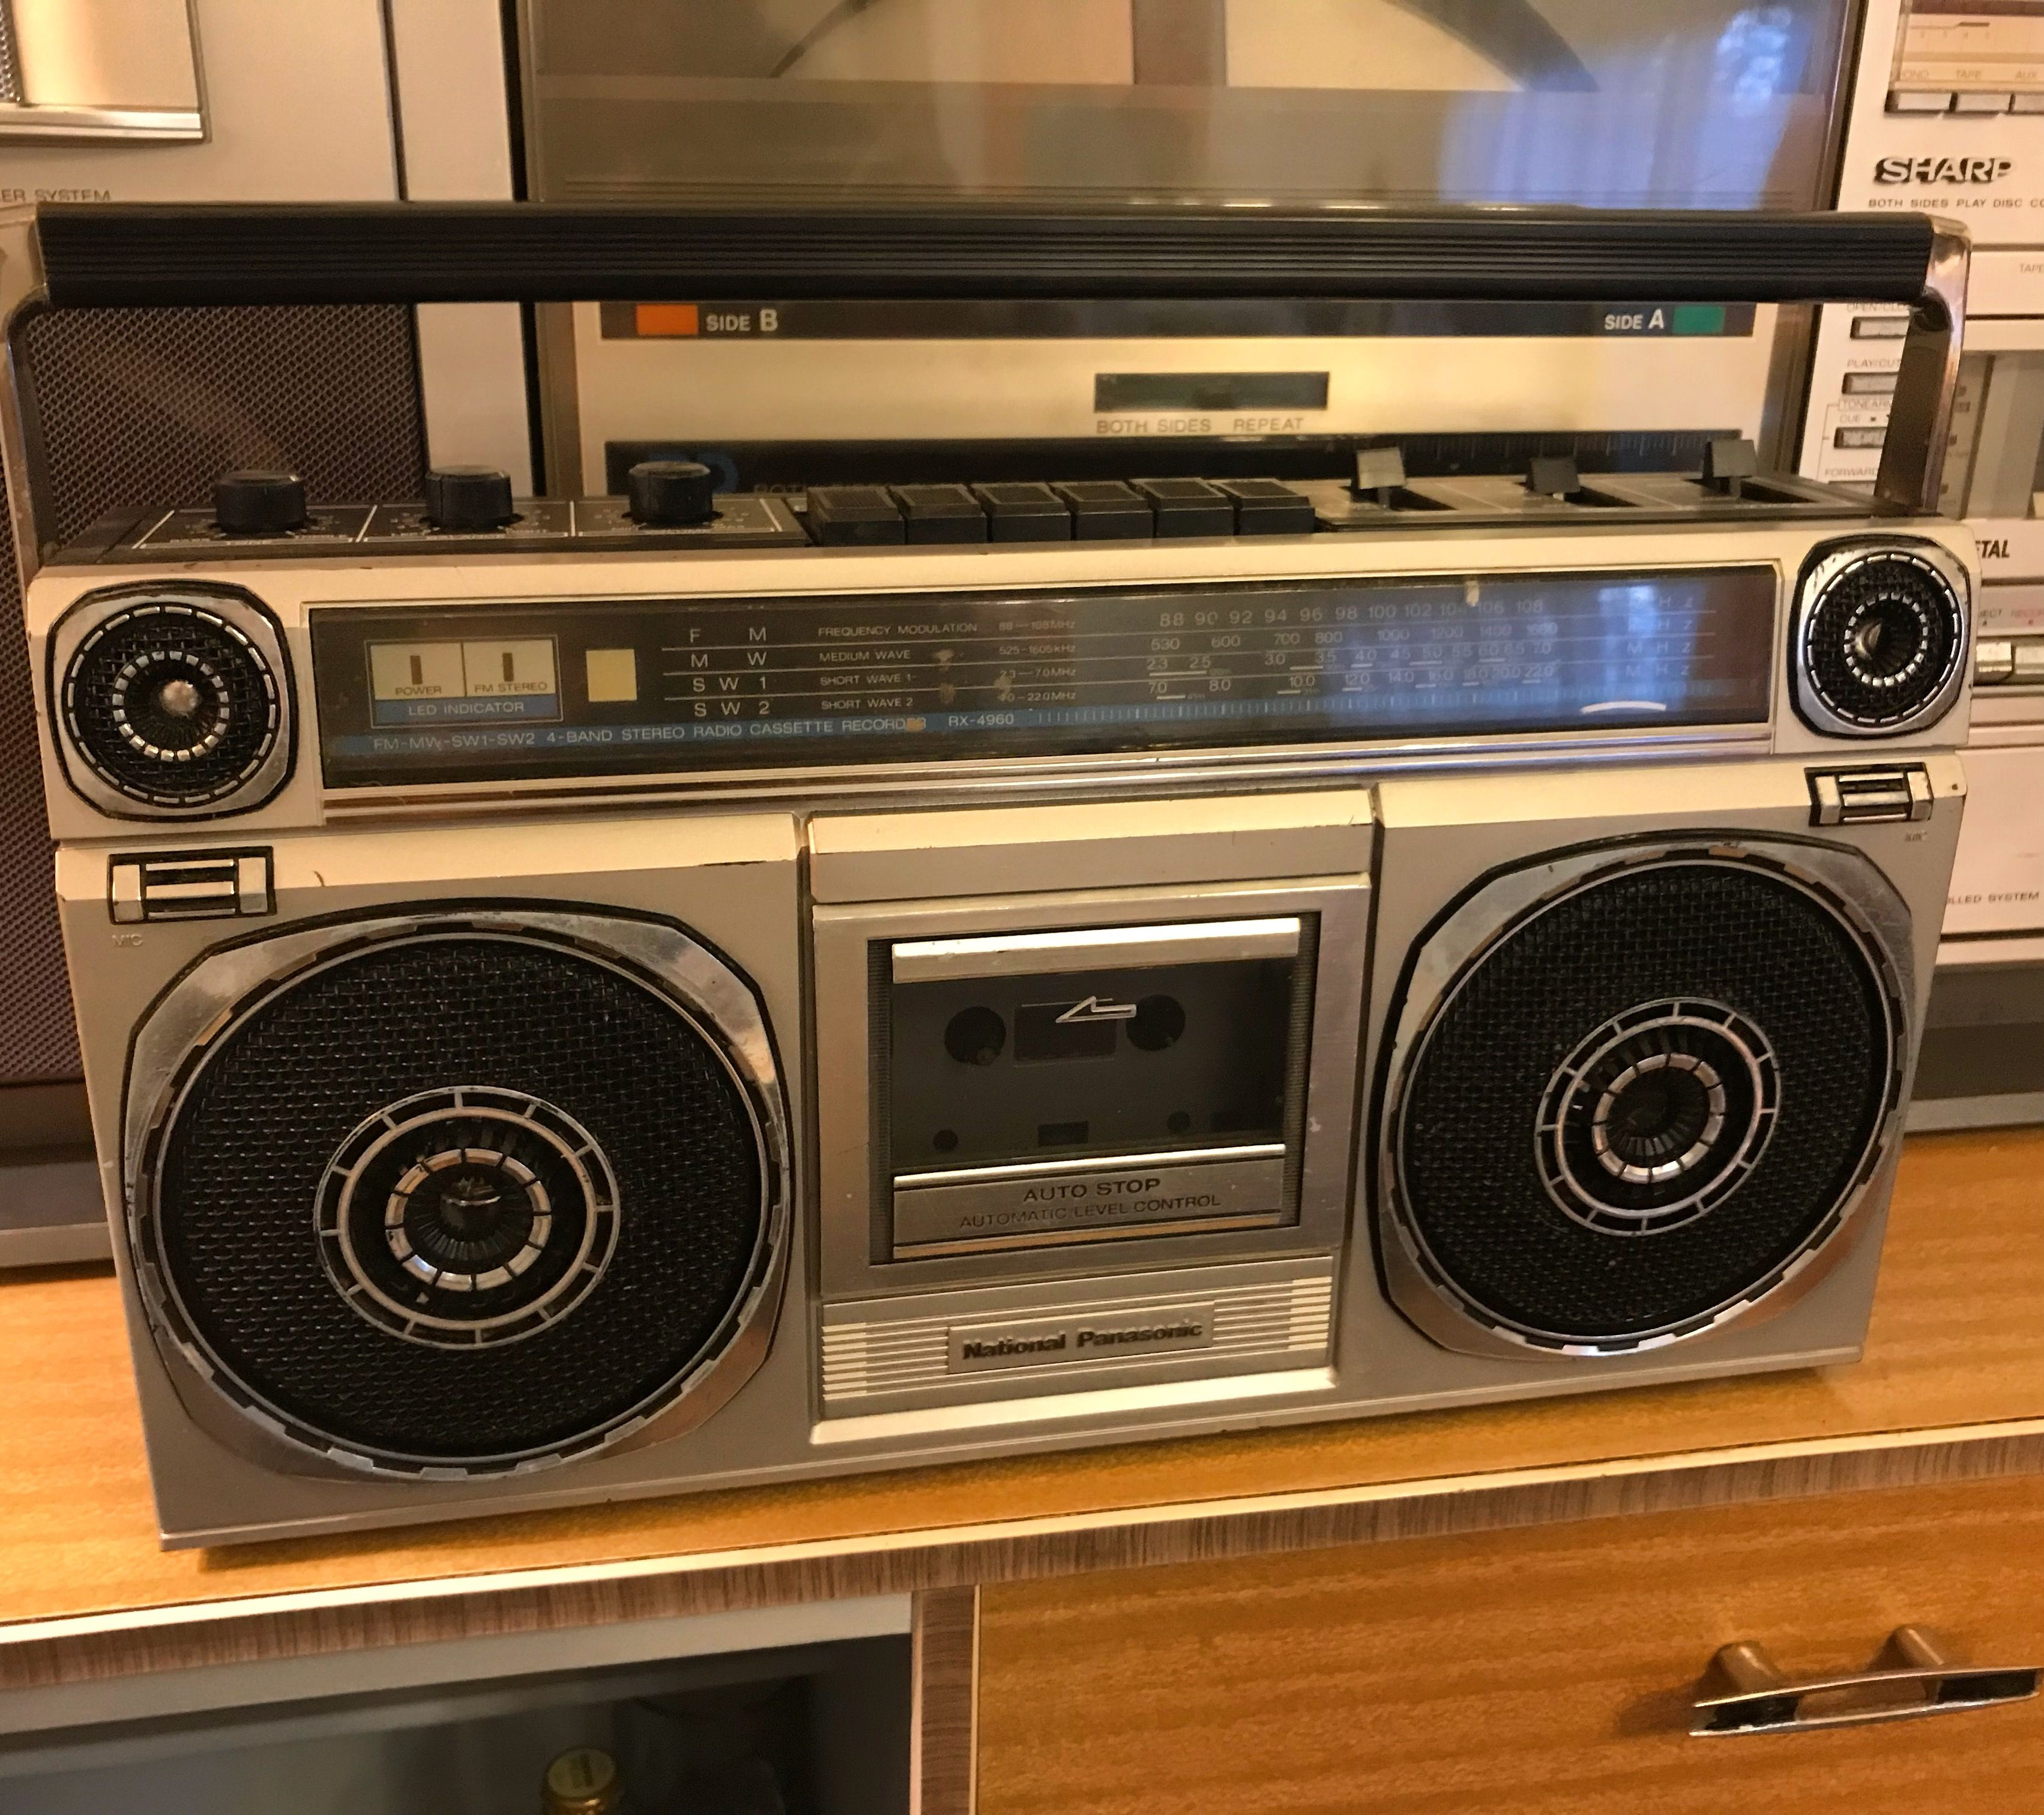 National Panasonic Rx 4960f Boombox Ghetto Blaster Boombox Record Players Hifi Audiophile